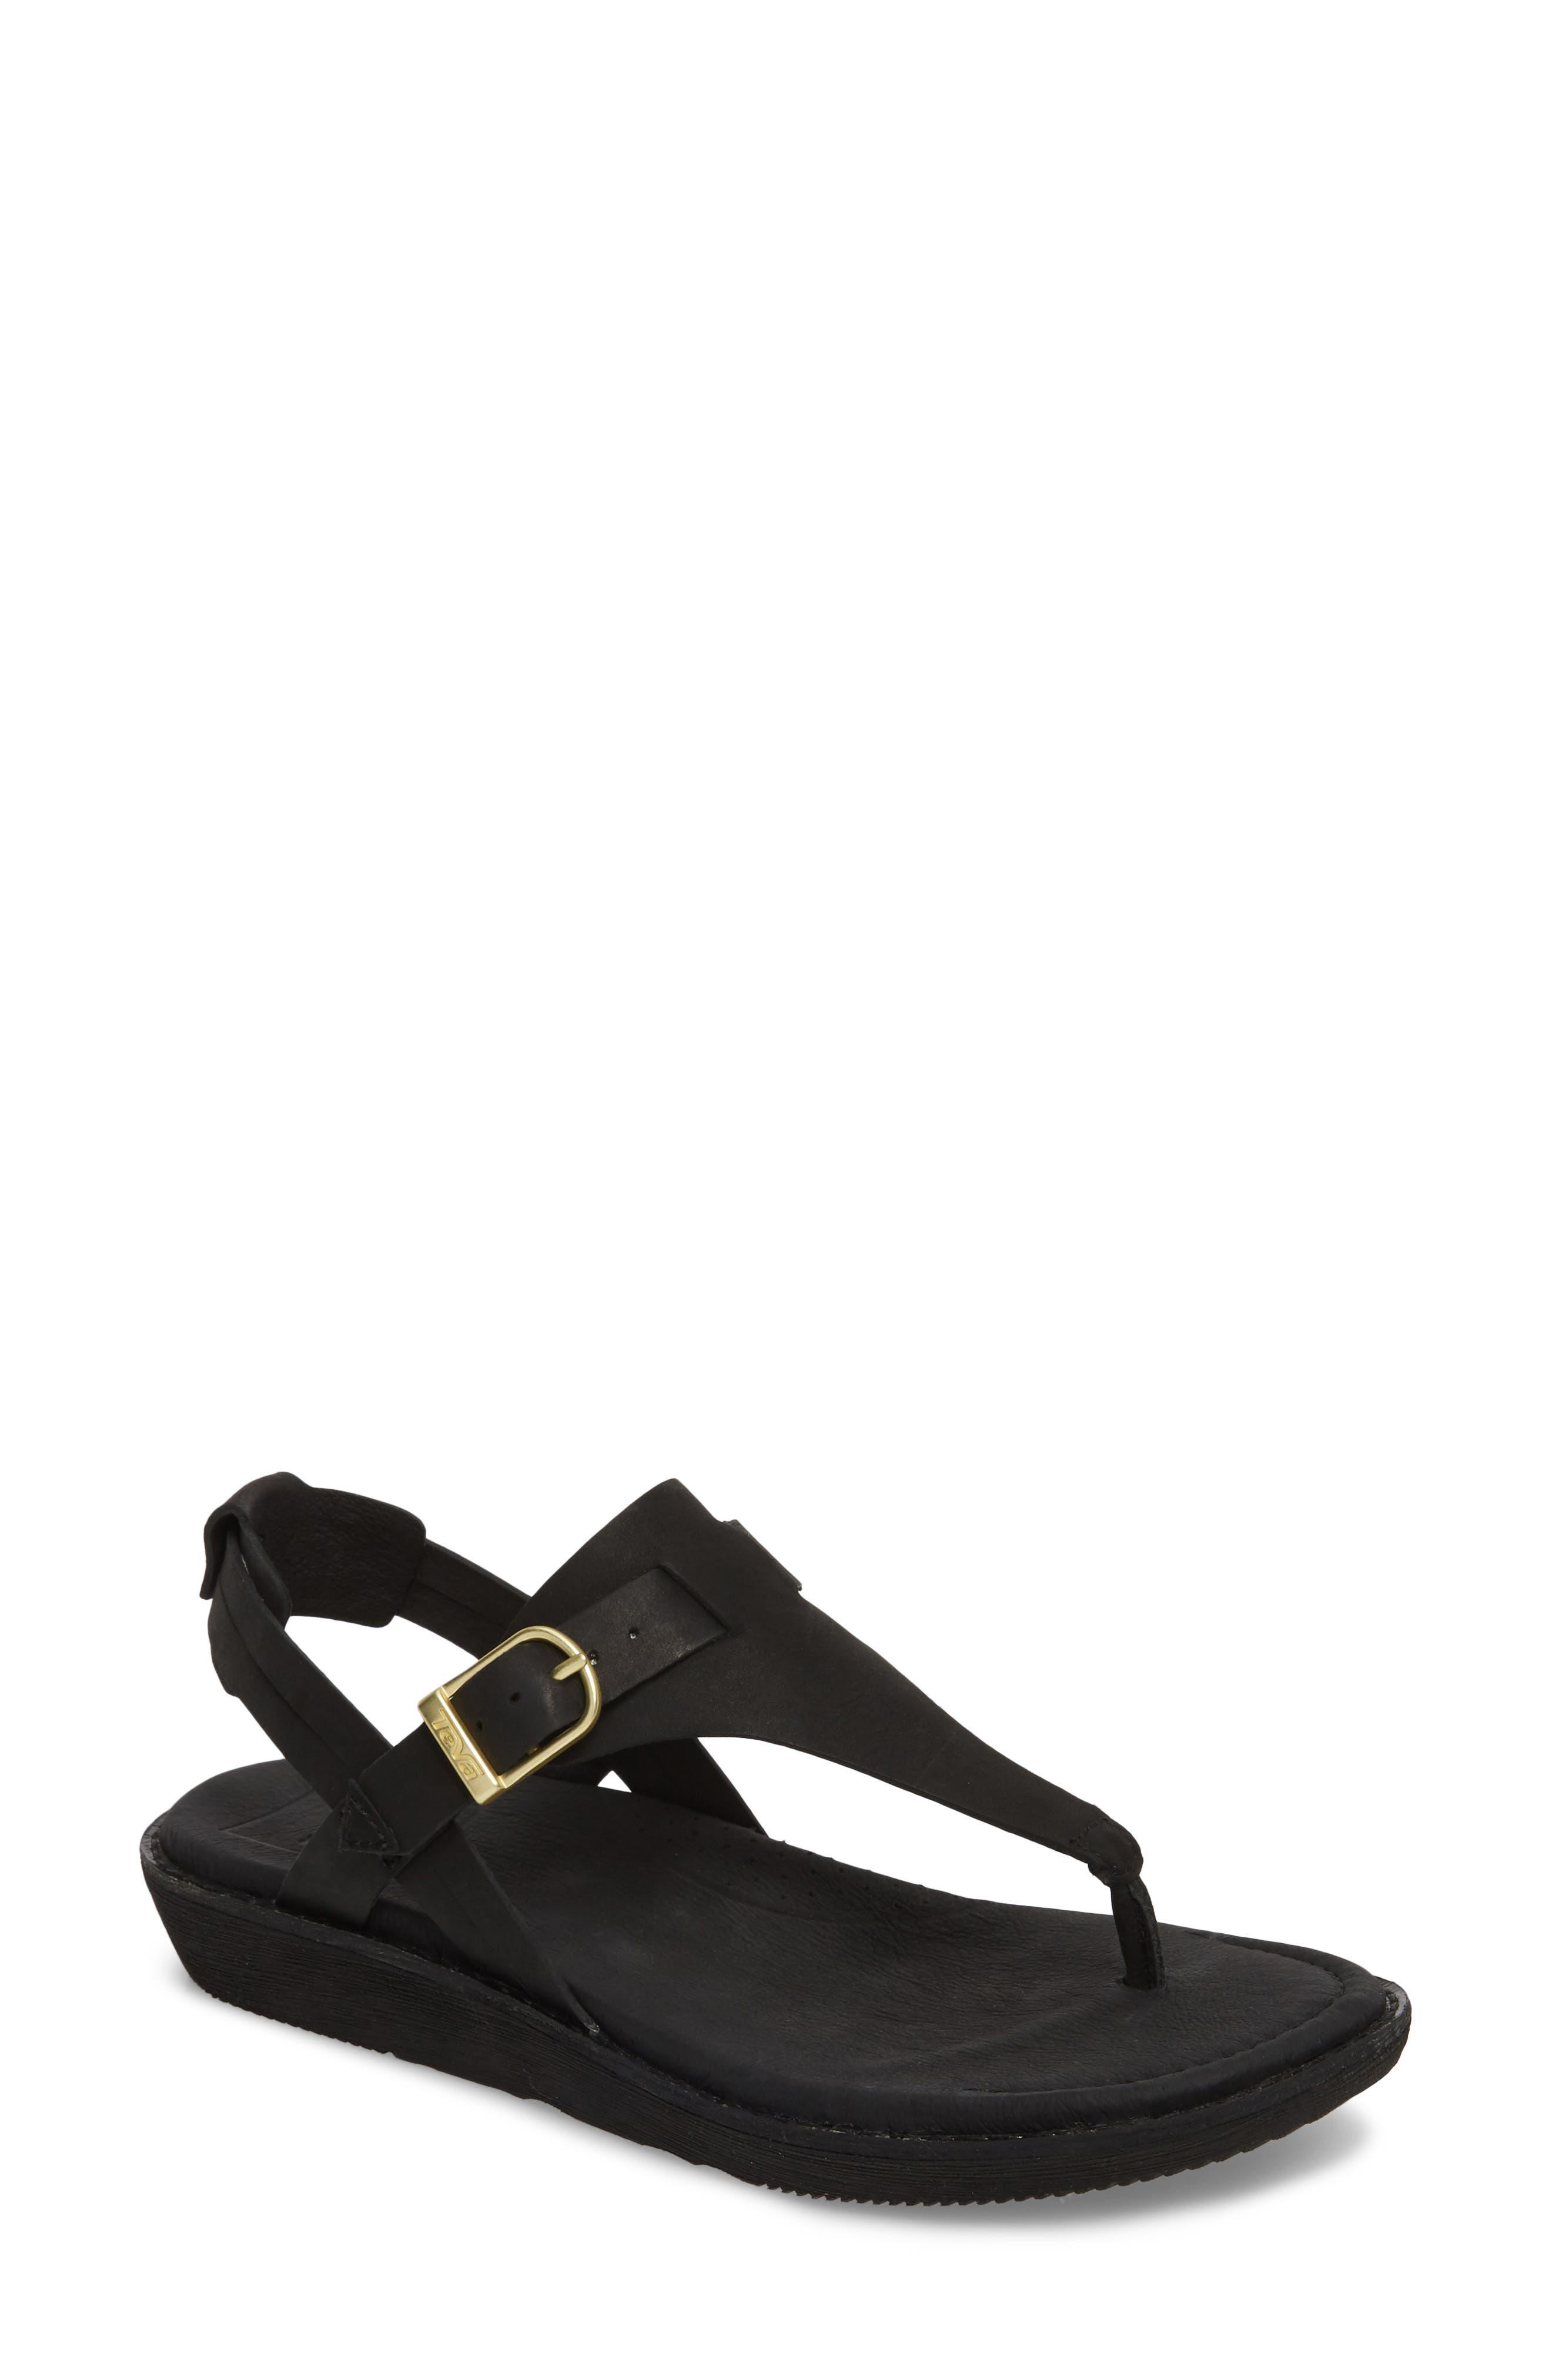 Encanta V-Strap Sandal,                         Main,                         color, 001